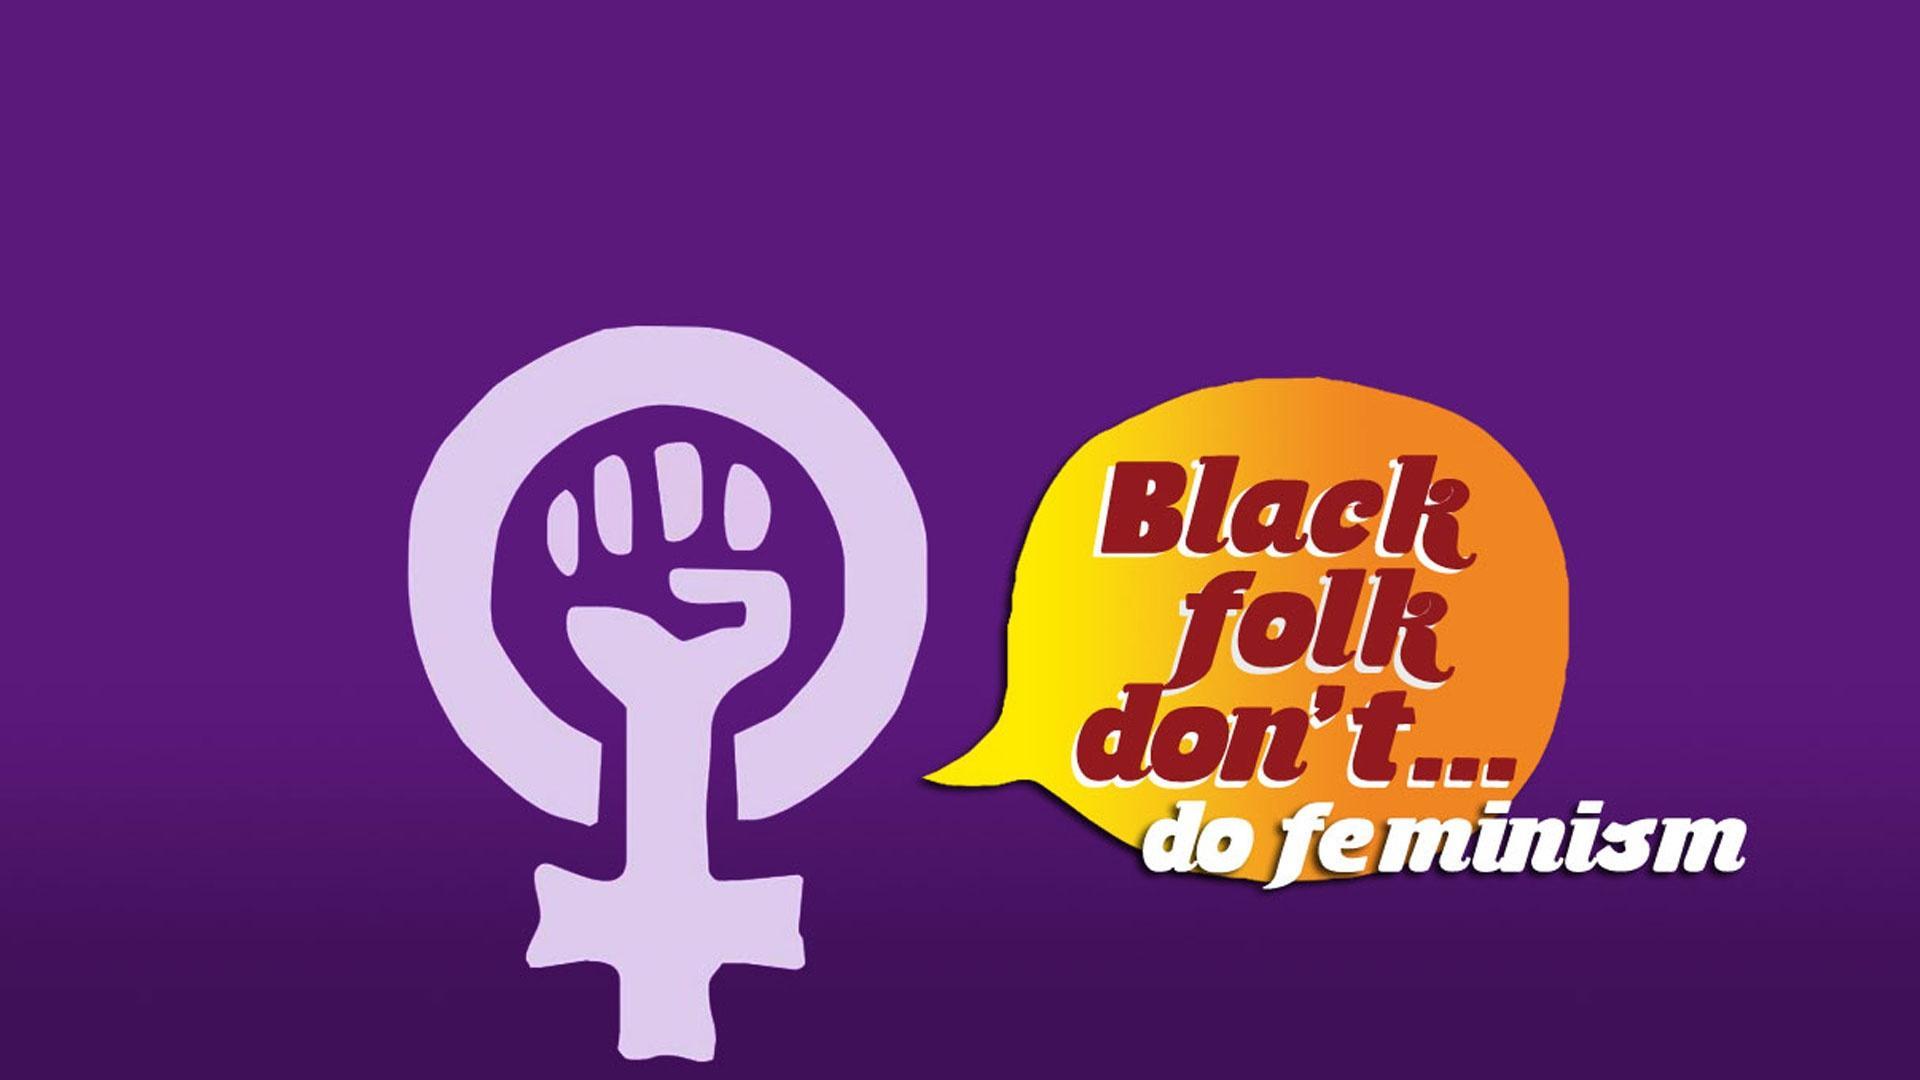 Do Feminism image